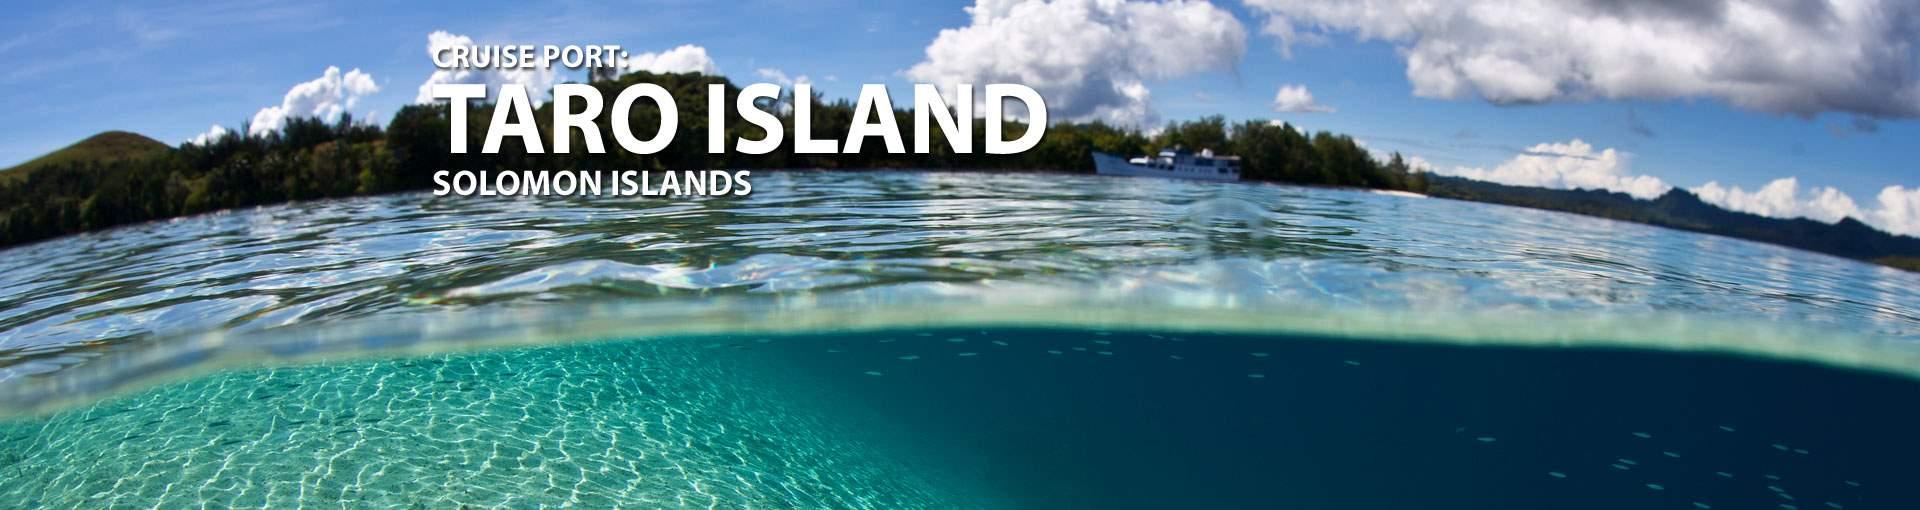 Cruises to Taro Island, Solomon Islands